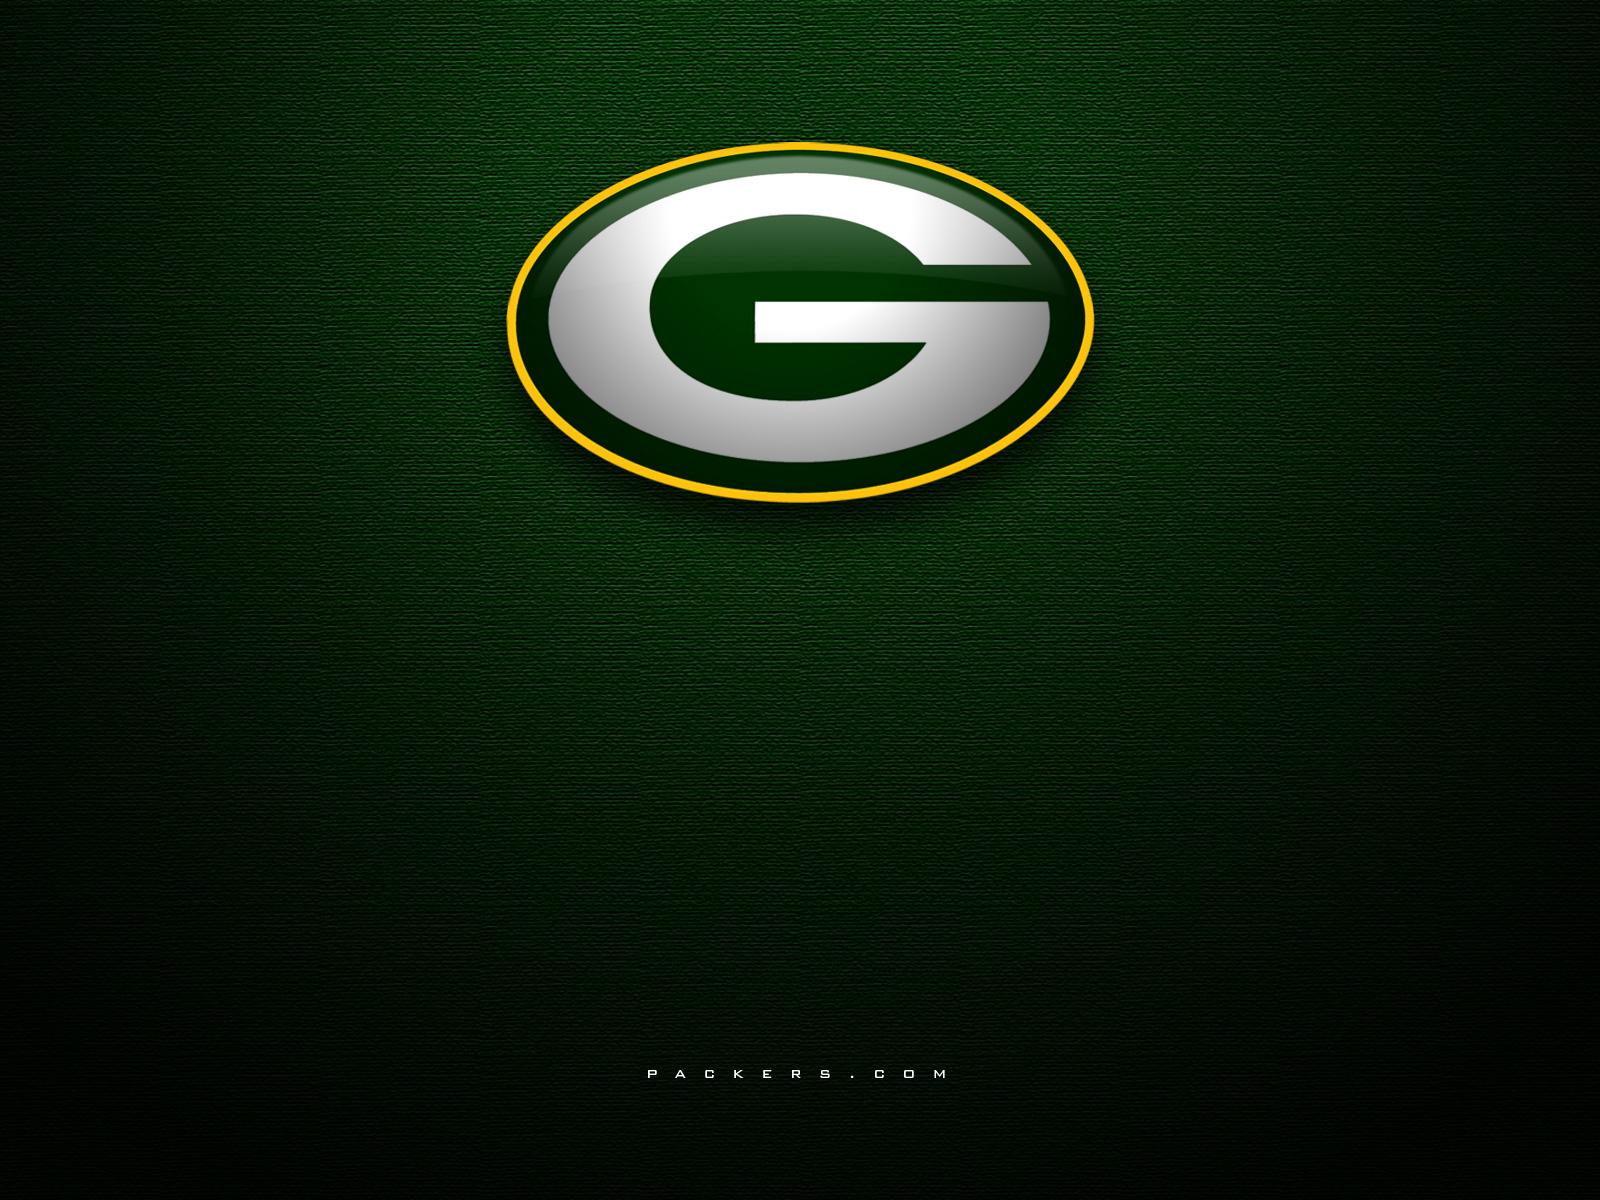 Packers Wallpaper 1600x1200 54121